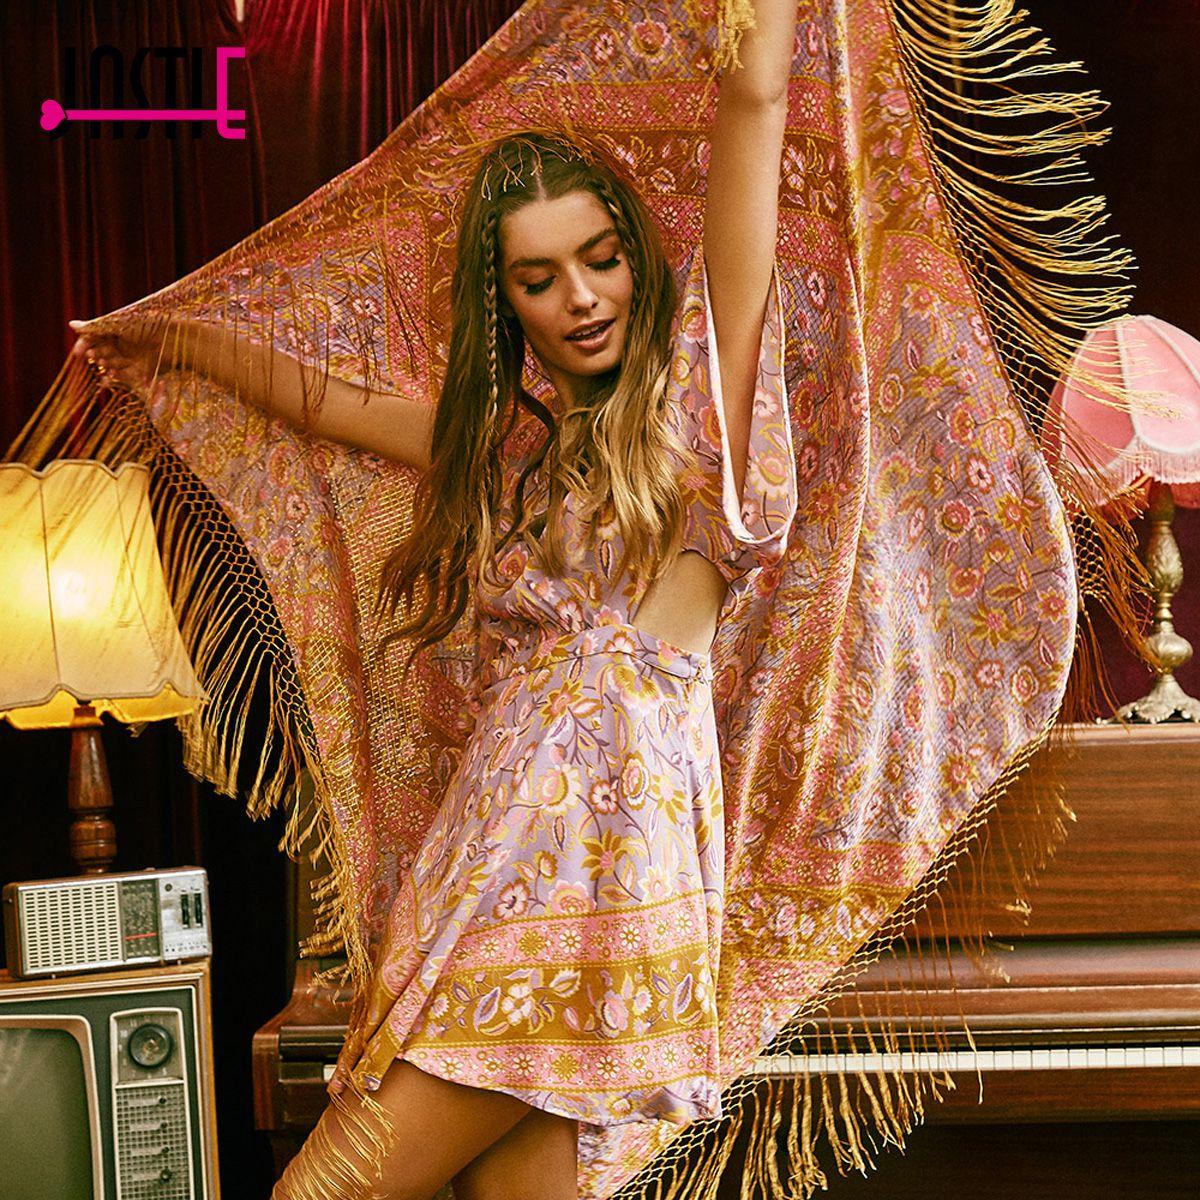 c0278ded3e Jastie Floral Print Boho Mini Dress V-Neck Flare Sleeve Waist Hollow Out  Sexy Dress 2017 Summer Casual Beach Short Women Dresses